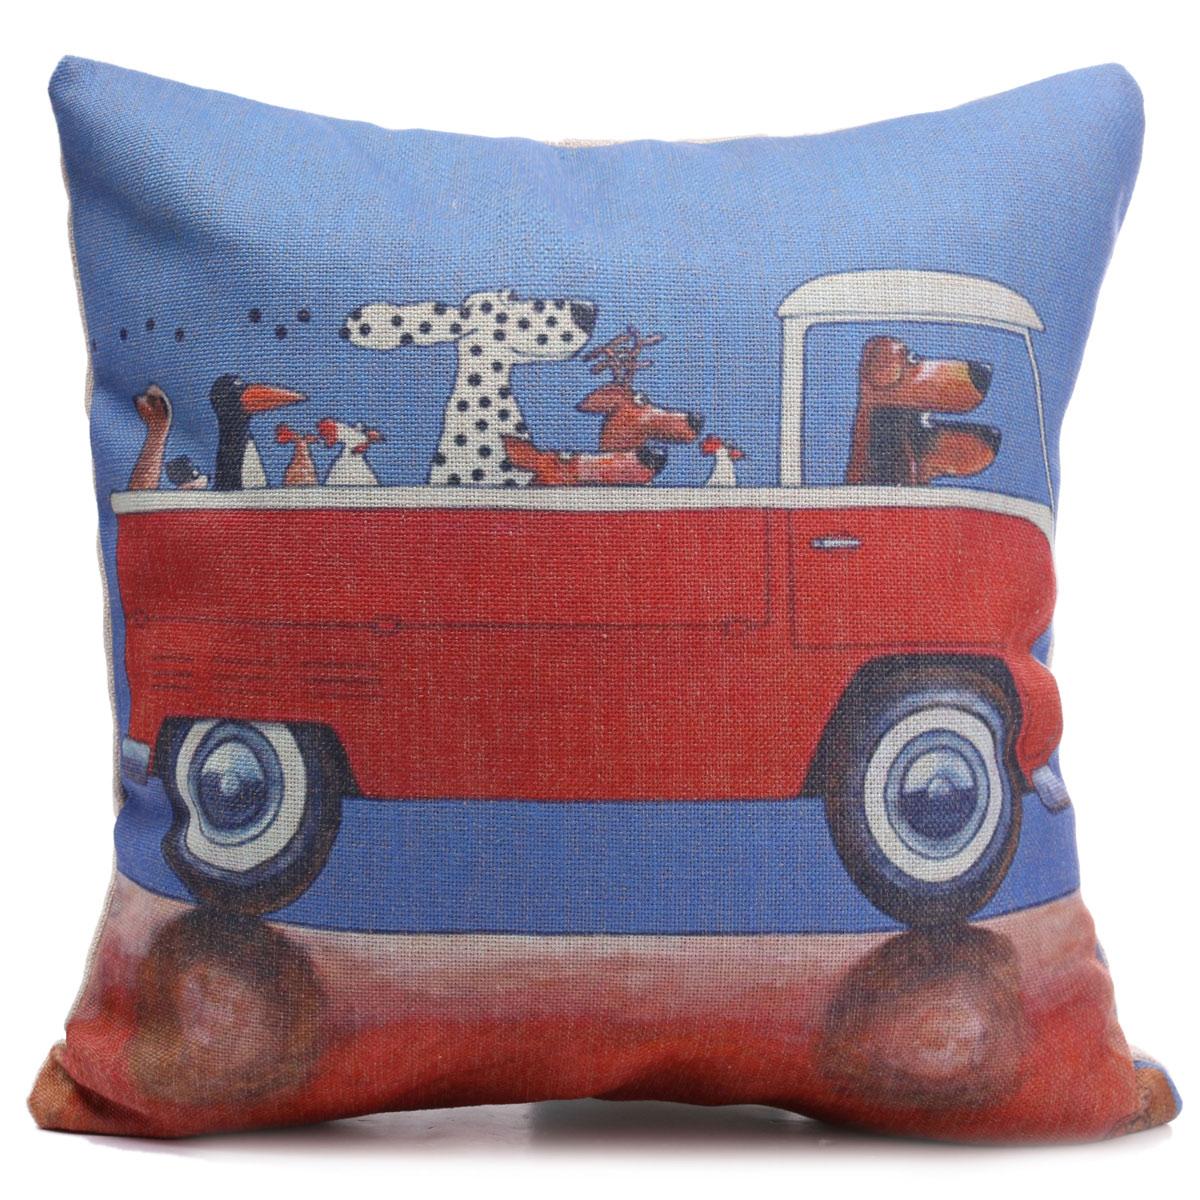 Vintage Car Dog Cat Cotten Linen Throw Pillow Case Cushion